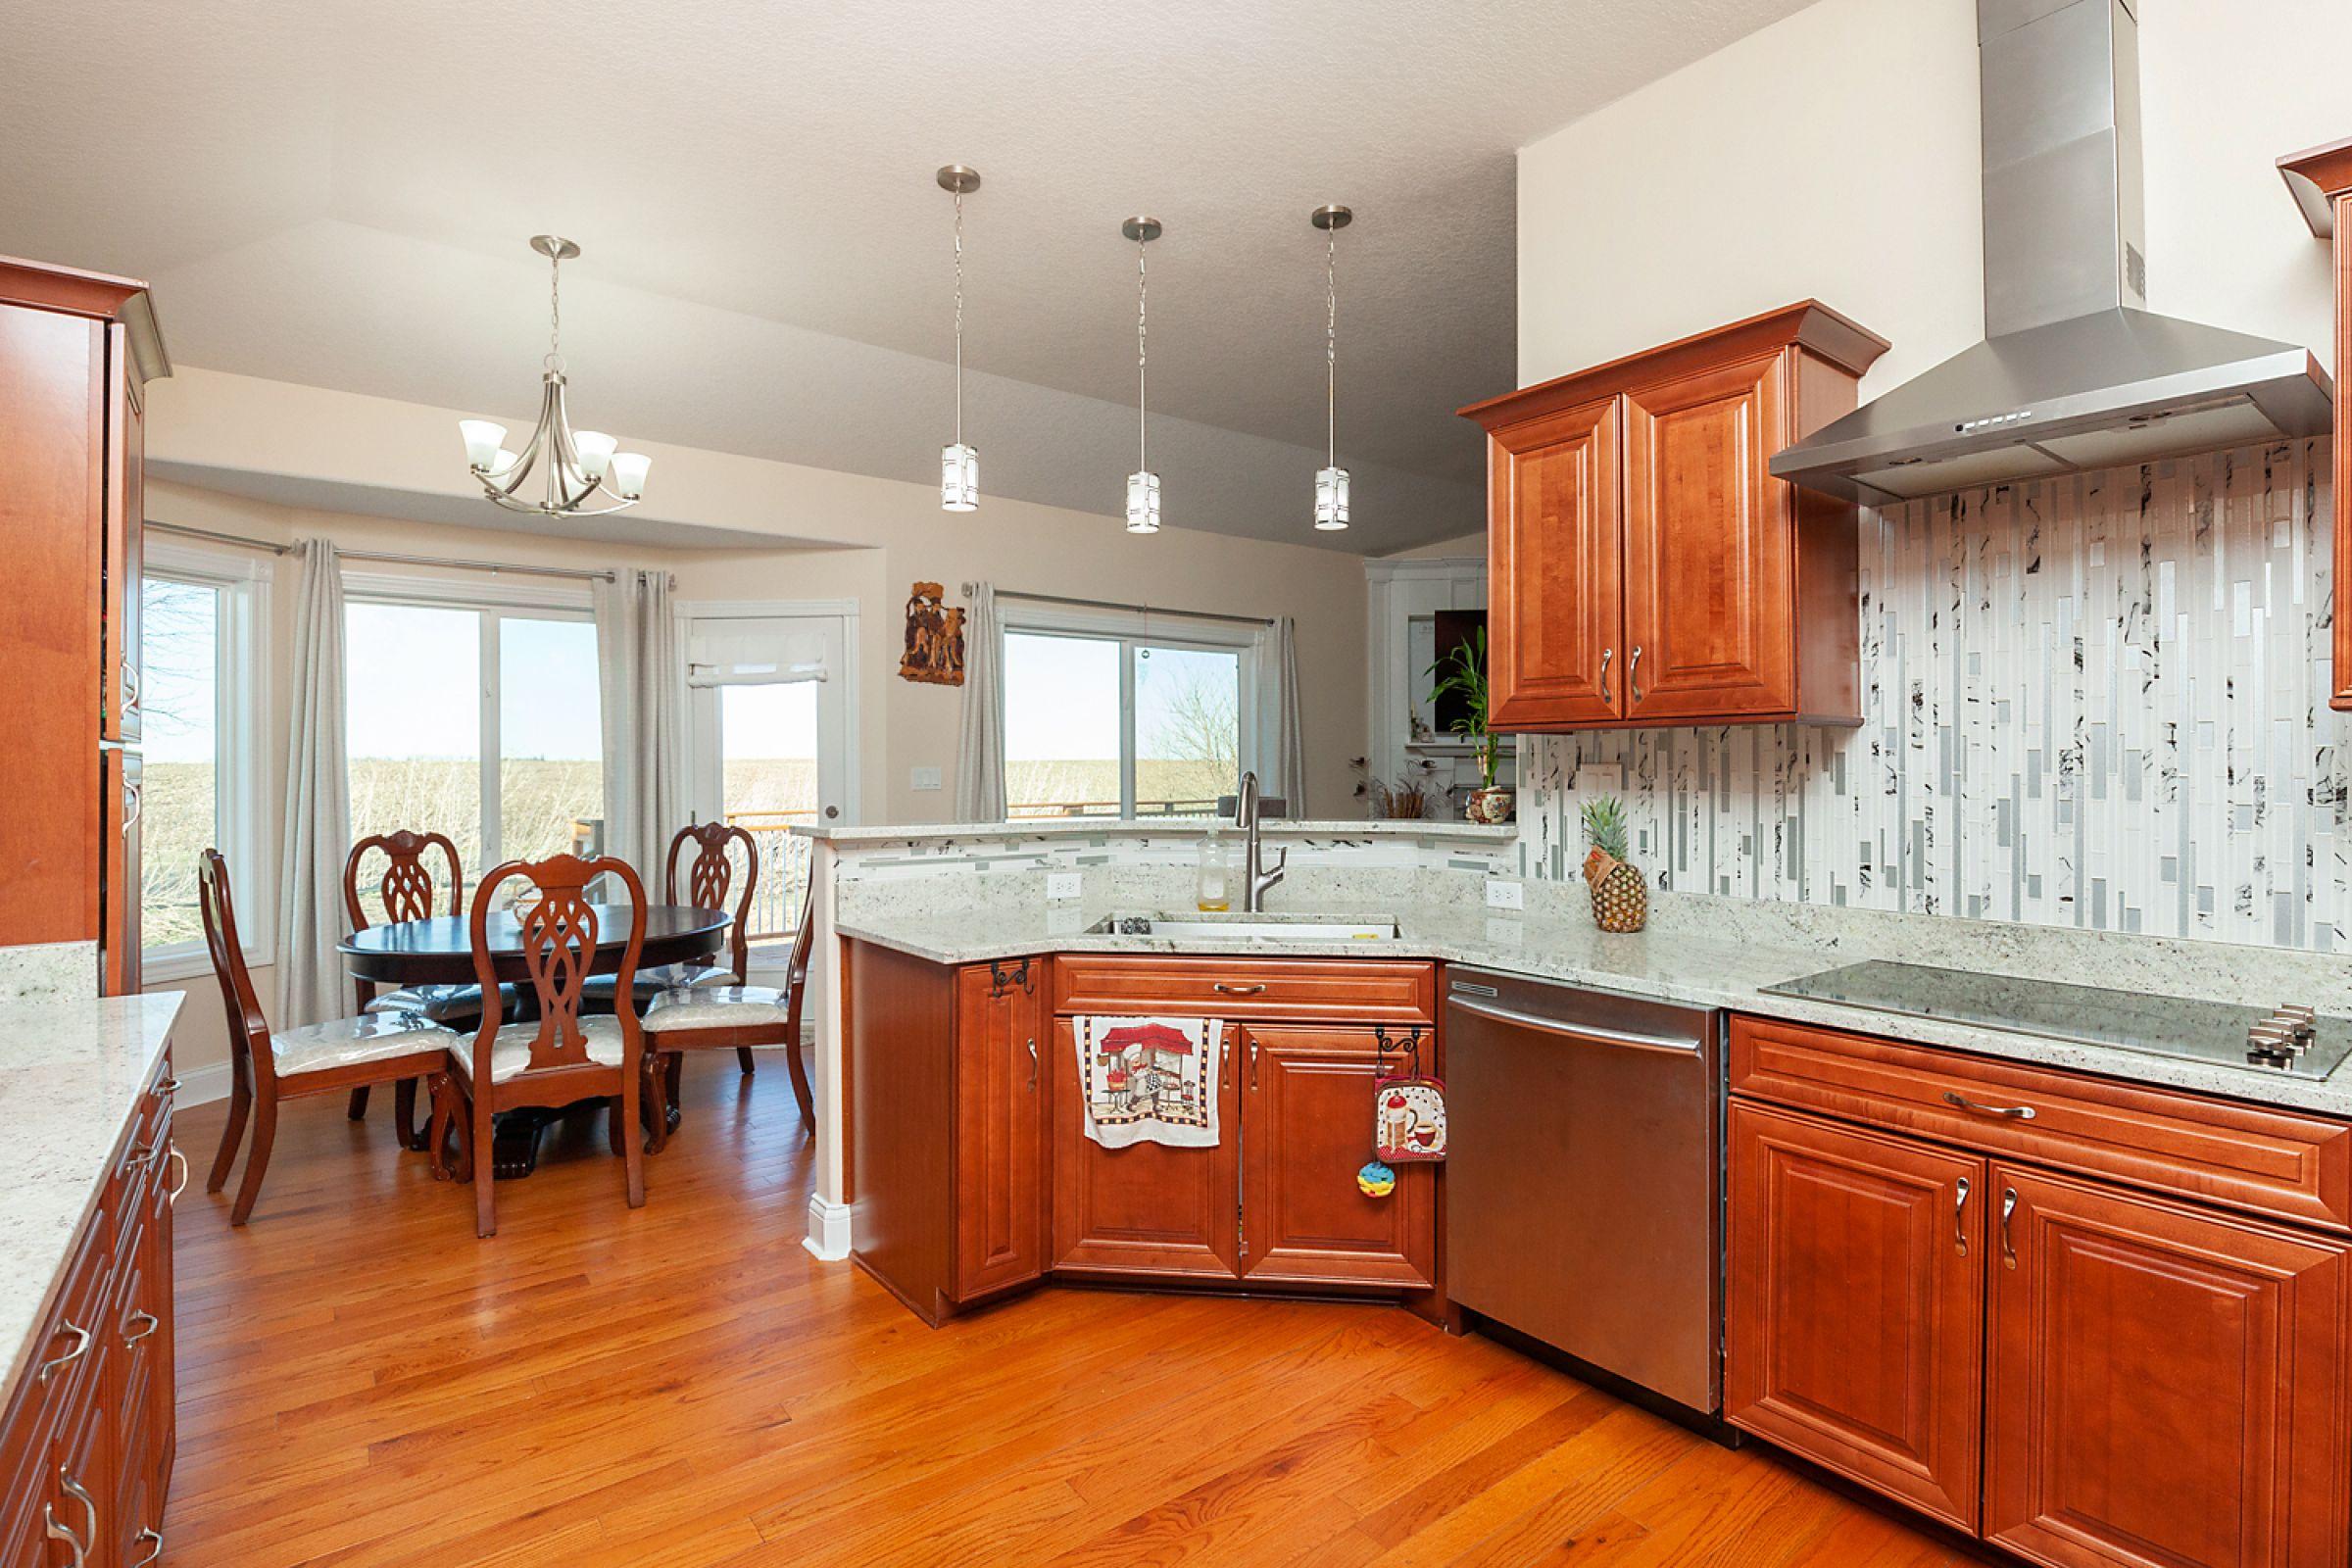 residential-polk-county-iowa-0-acres-listing-number-15403-4-2021-03-12-053308.jpg